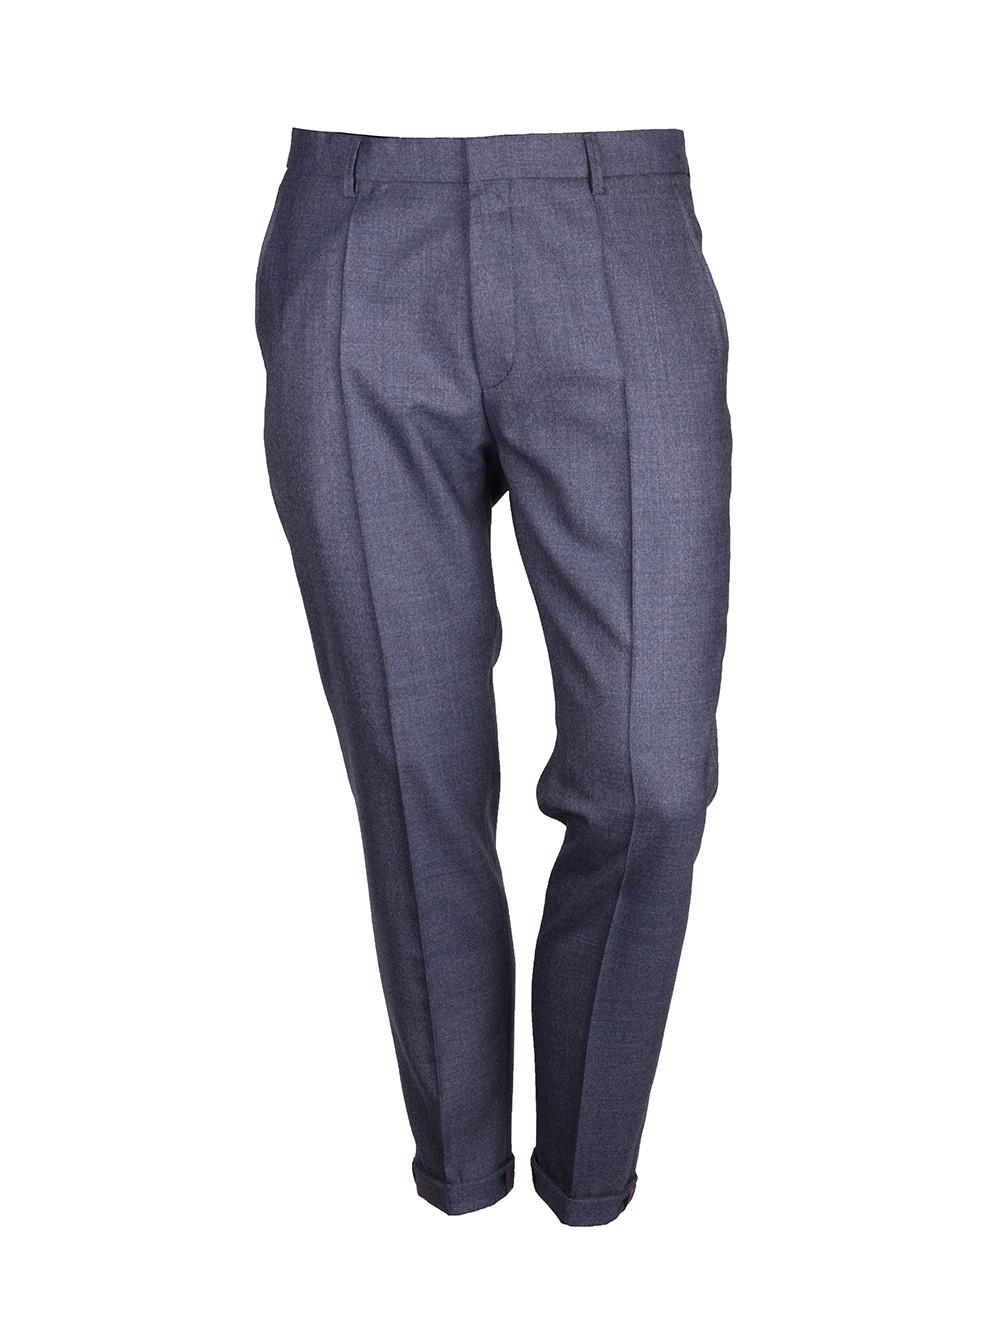 HUGO Παντελόνι άπιετο HENDRIS 17399-402 ΜΠΛΕ